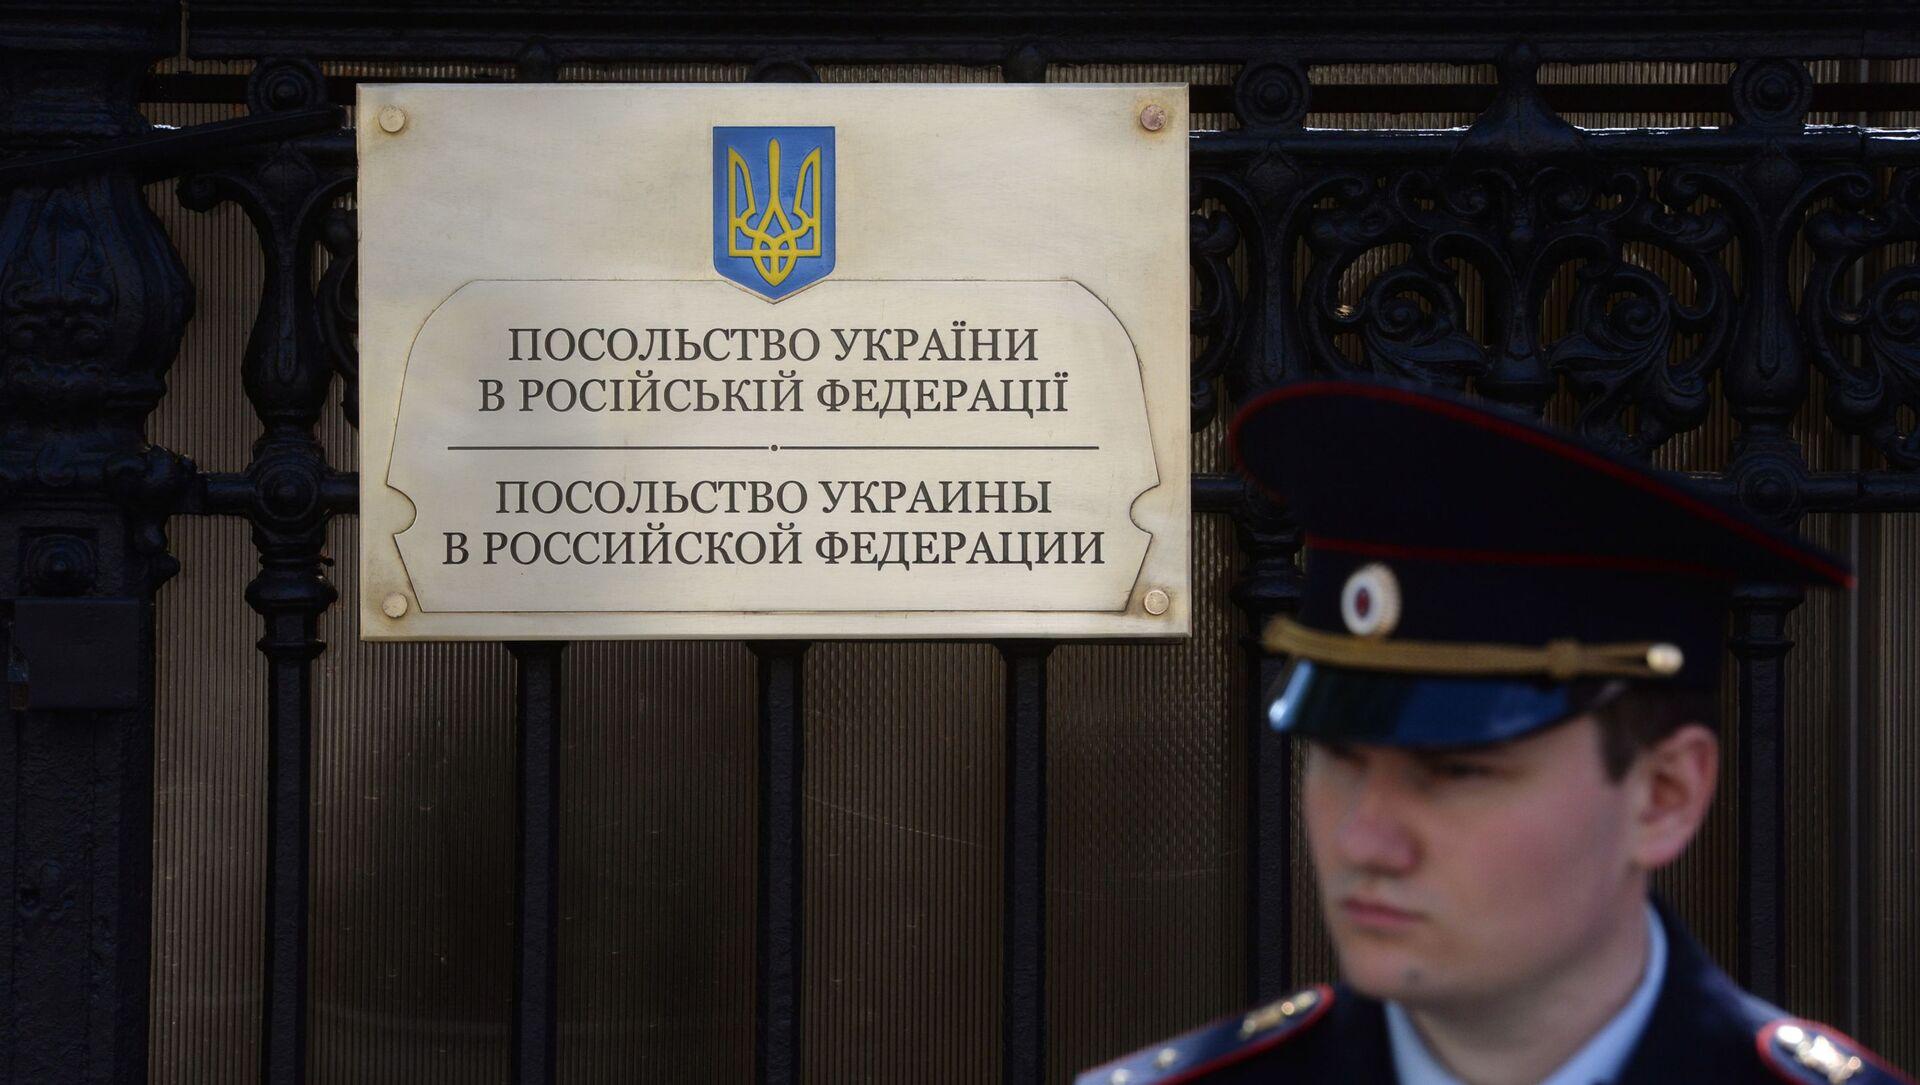 Ambasada Ukrainy w Moskwie - Sputnik Polska, 1920, 26.04.2021